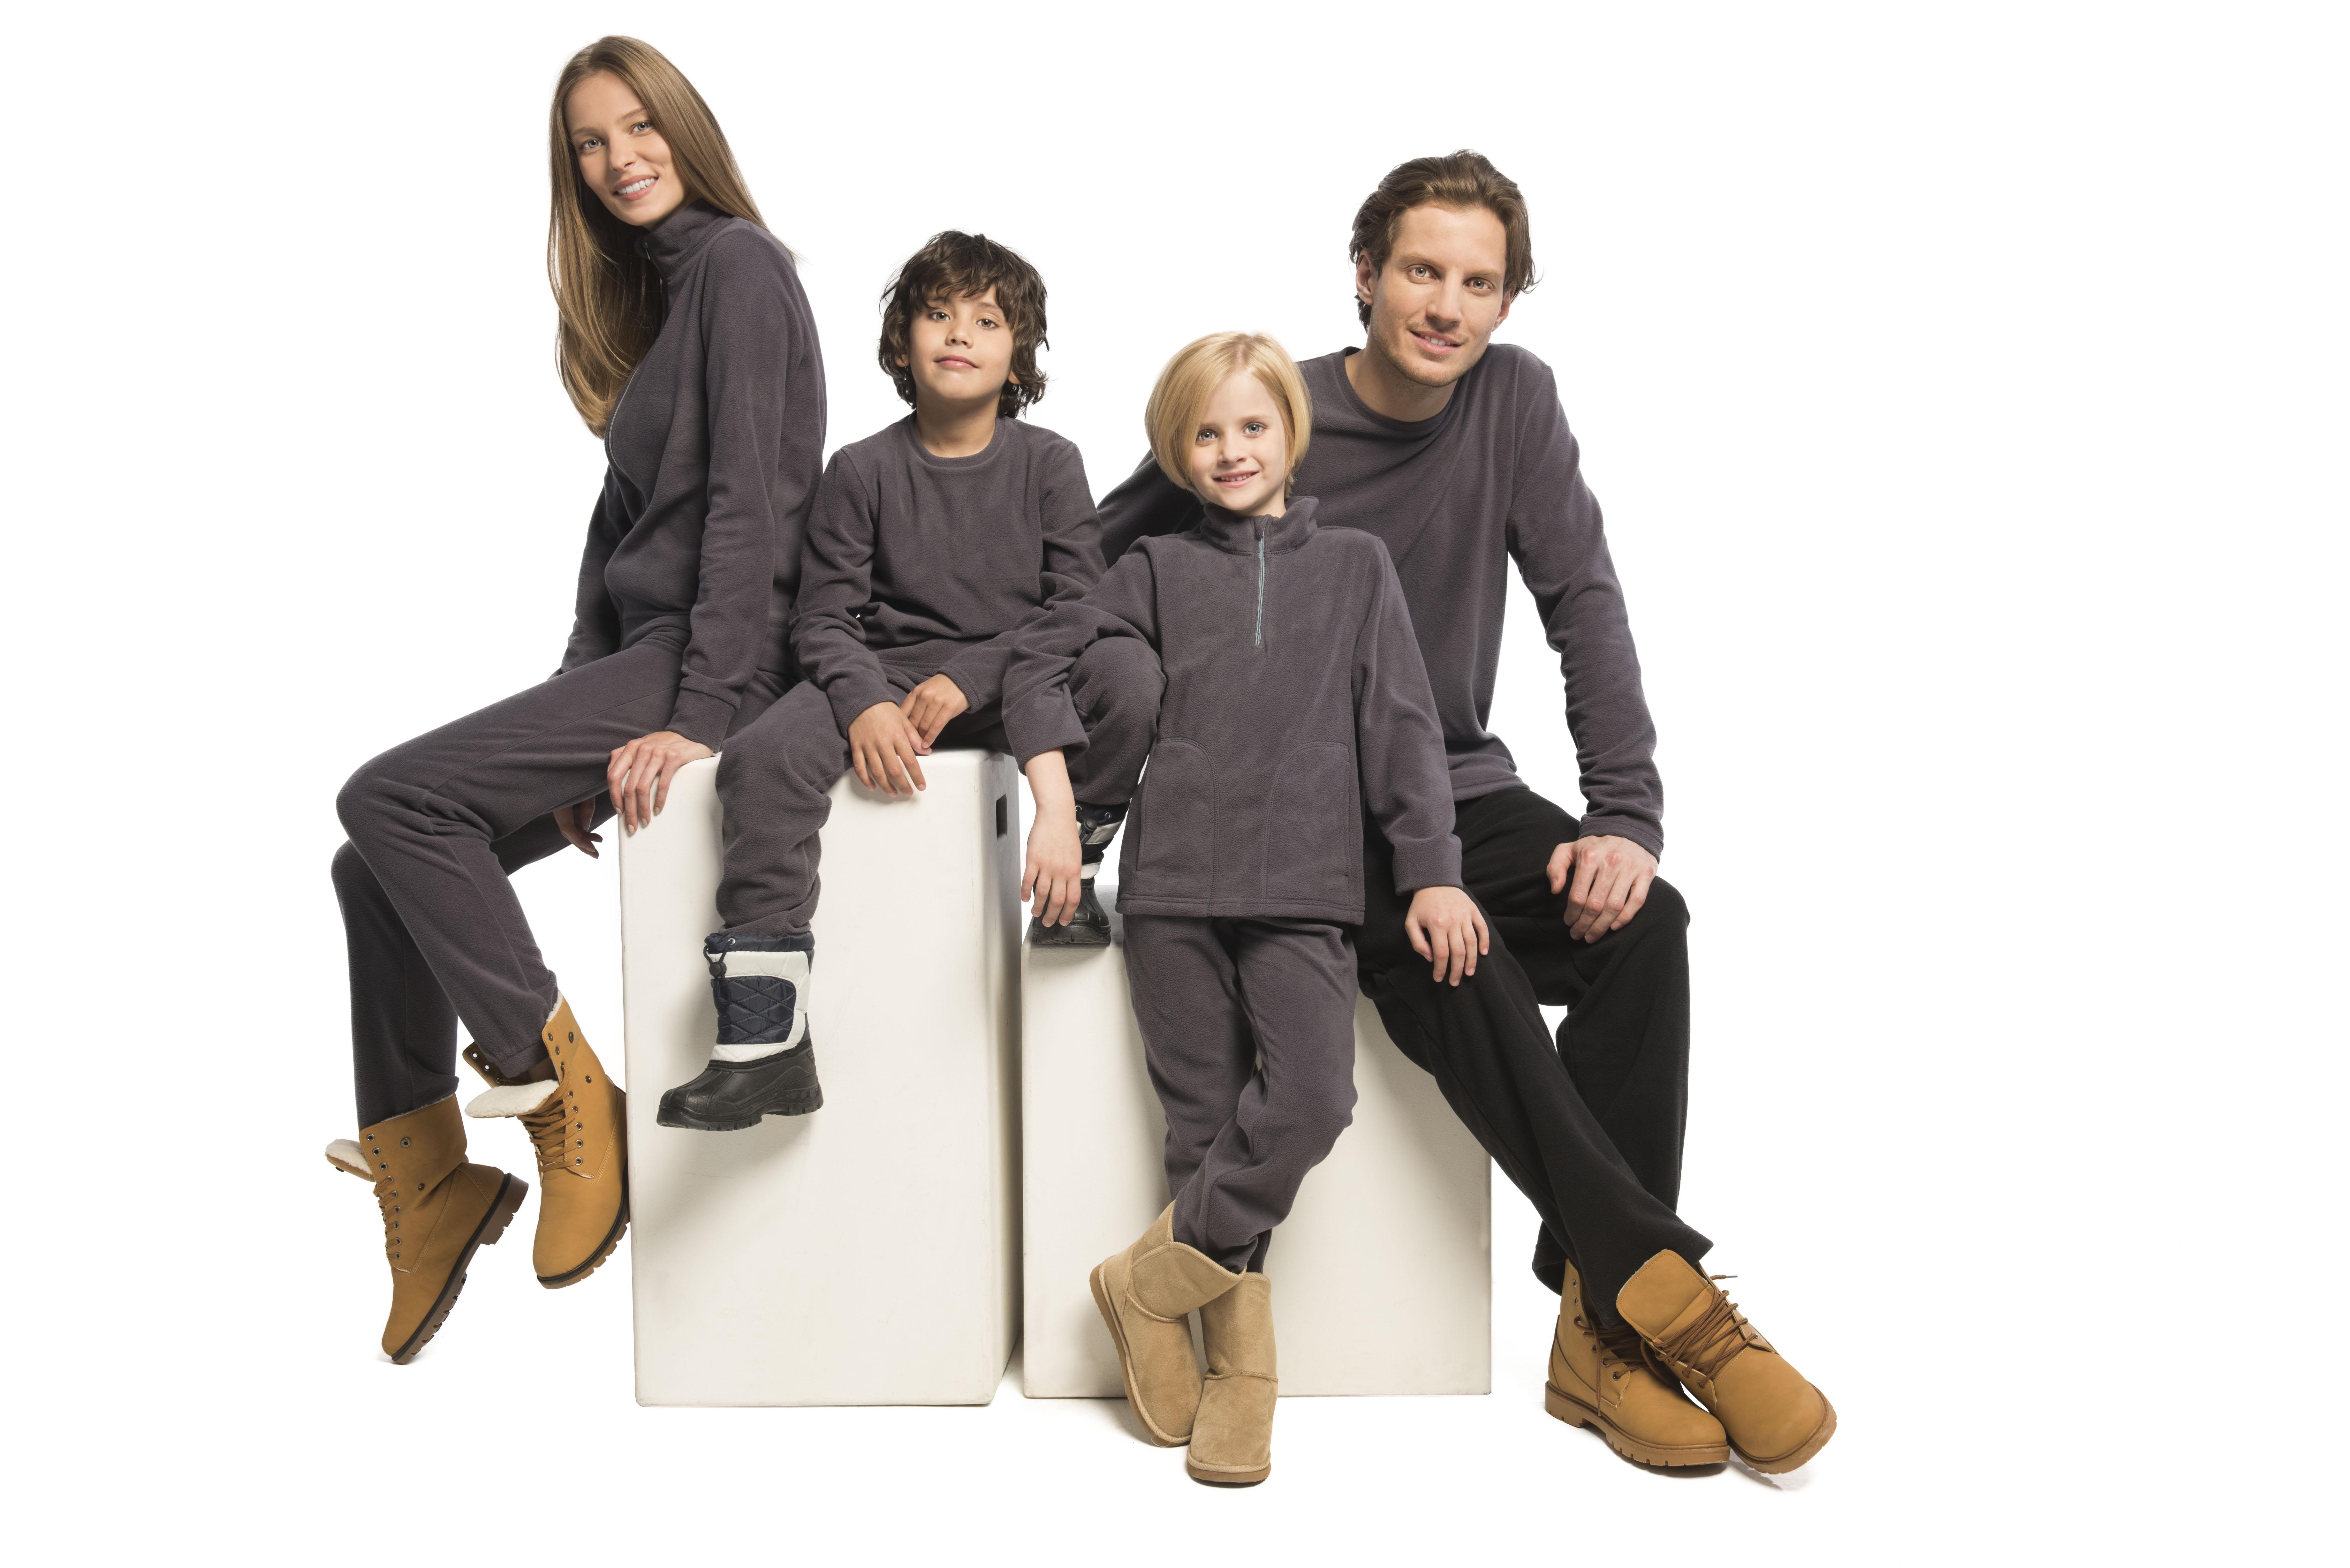 повар грузин, фото семьи реклама обуви собираются контейнере